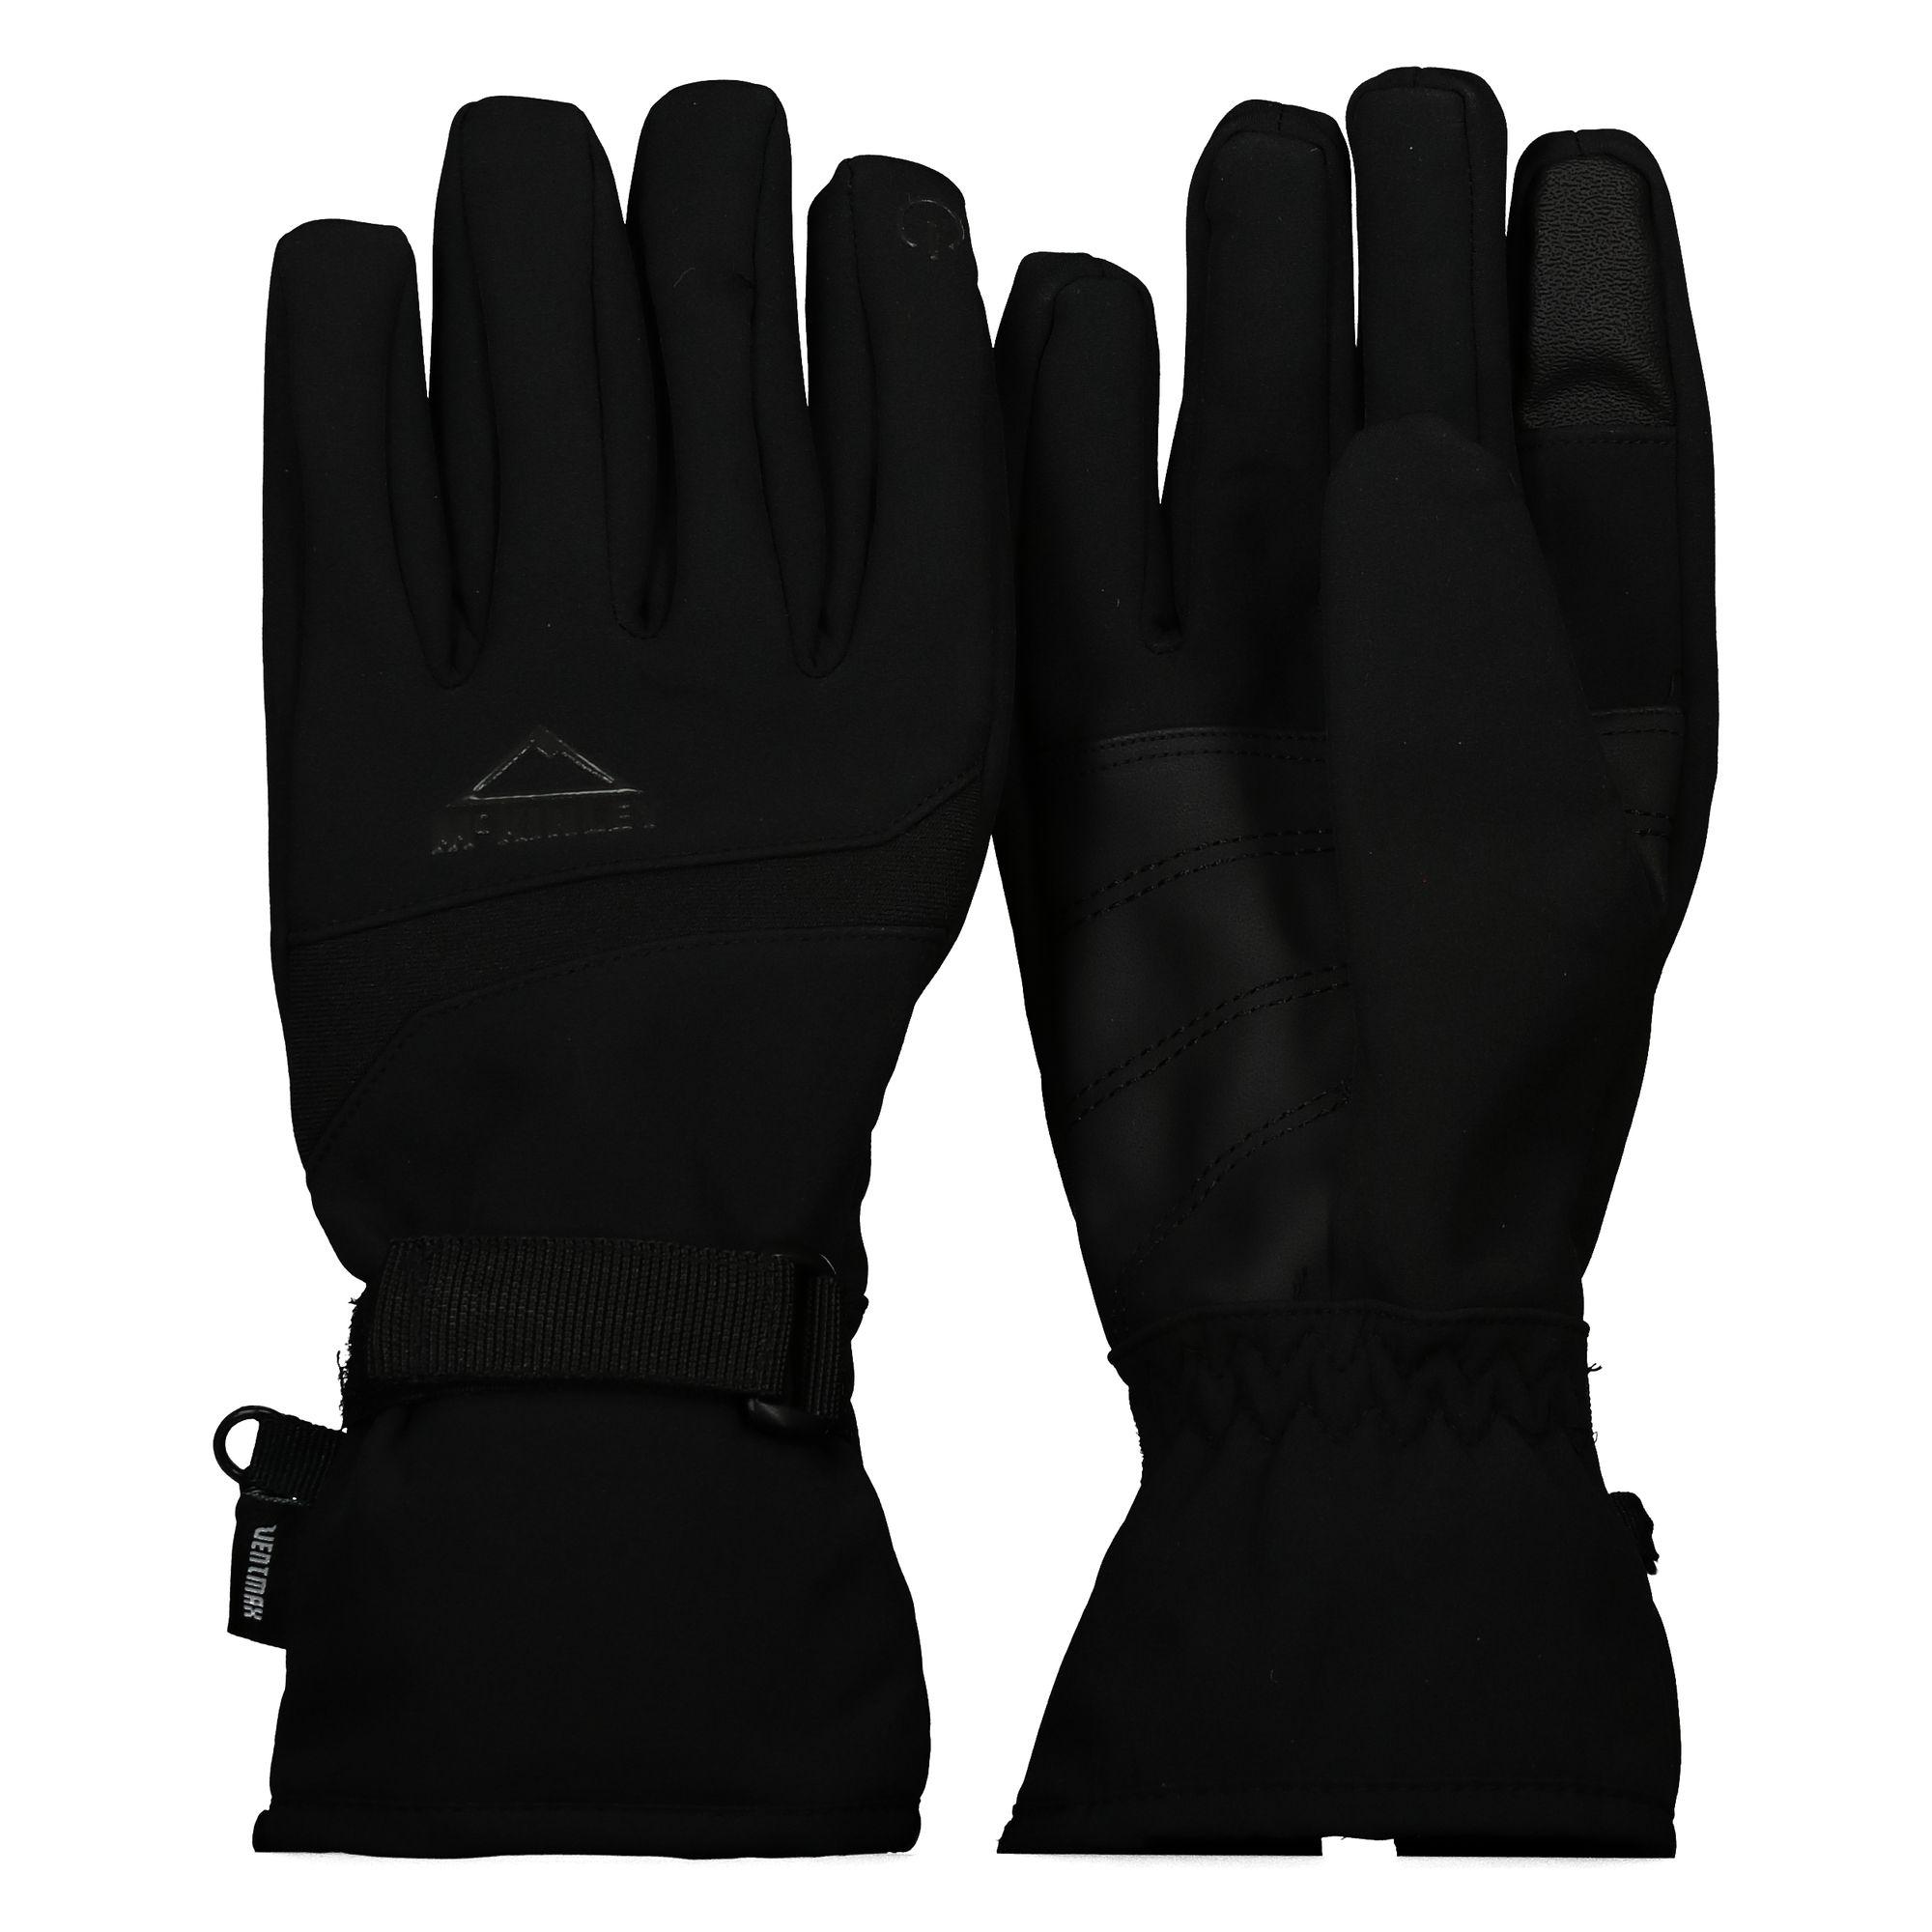 mckinley new rummer winterhandschuhe herren i tip black. Black Bedroom Furniture Sets. Home Design Ideas